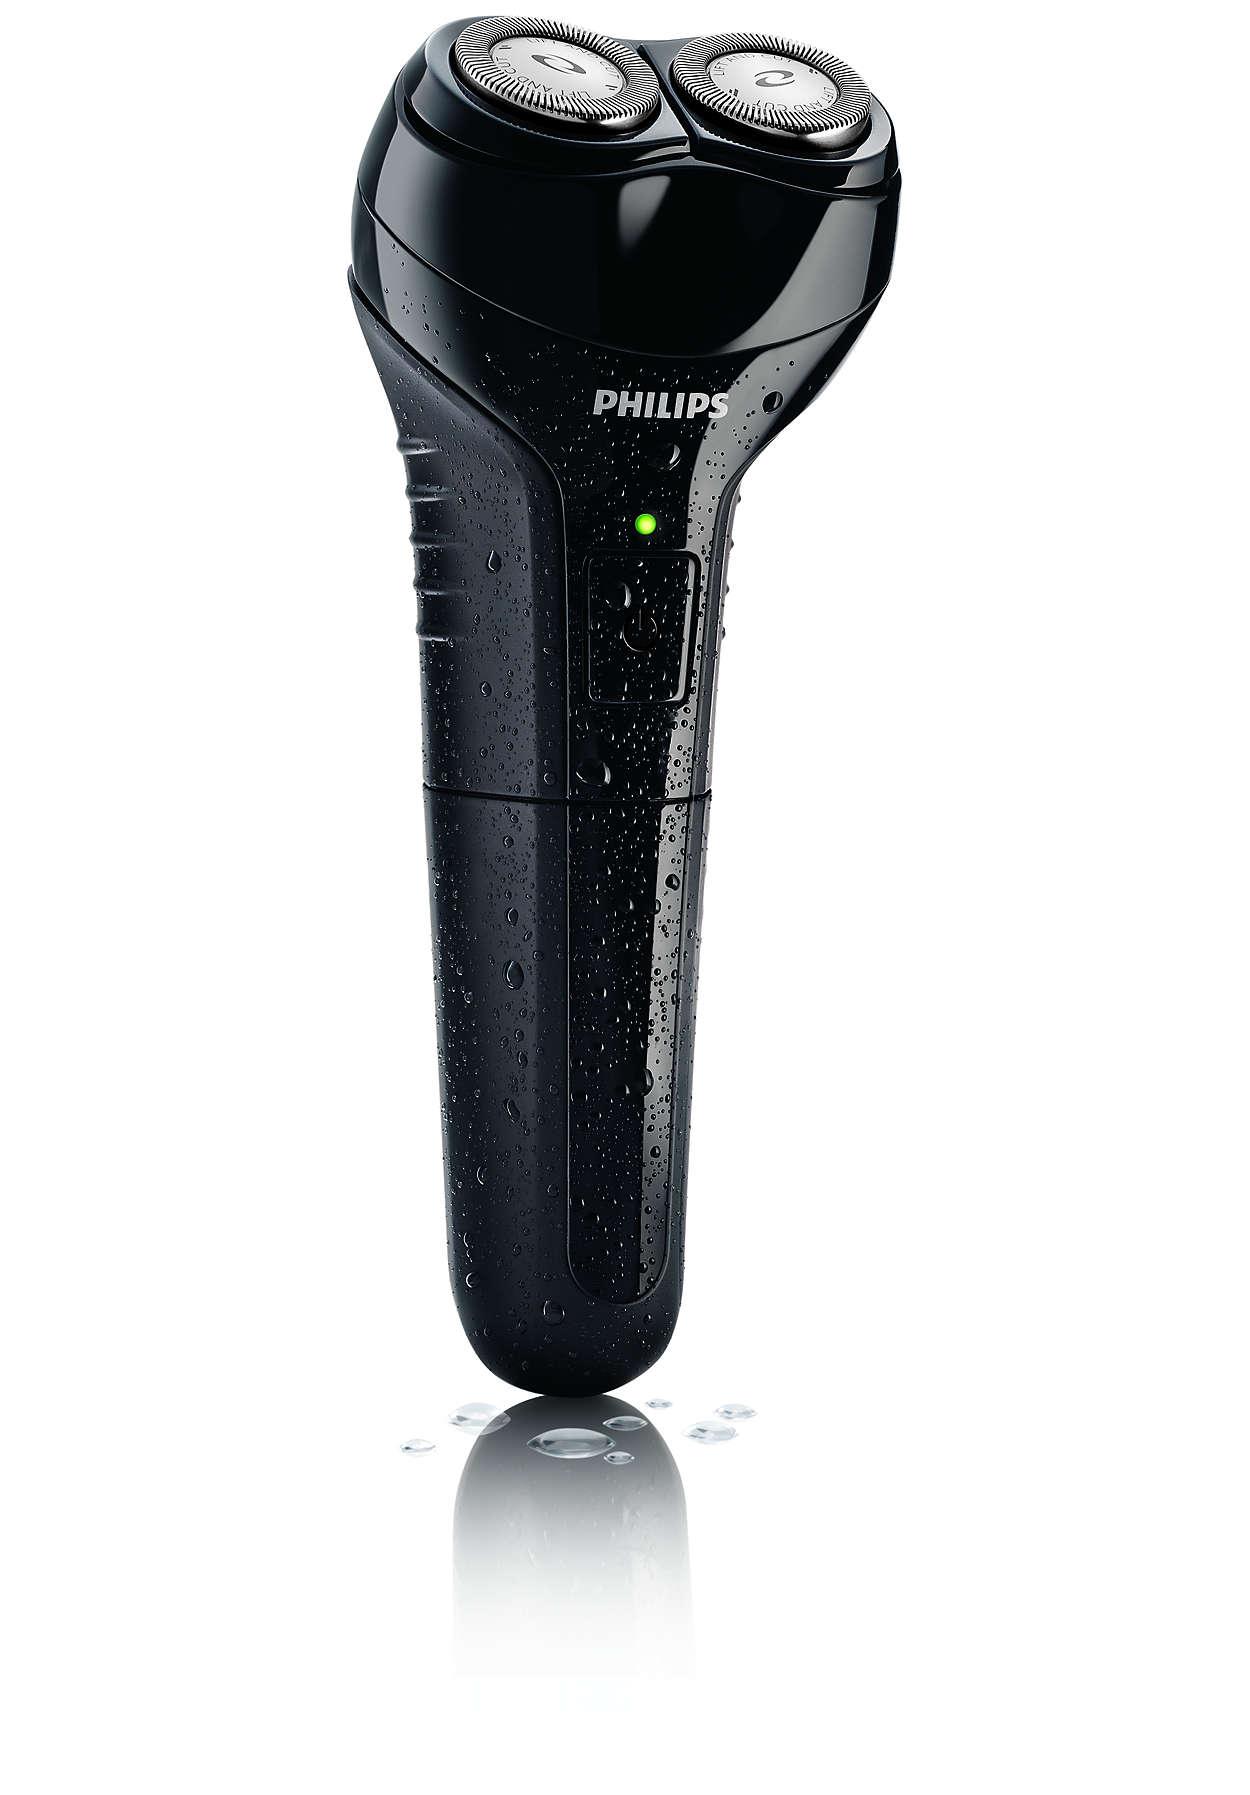 Pencukur listrik Philips HQ912